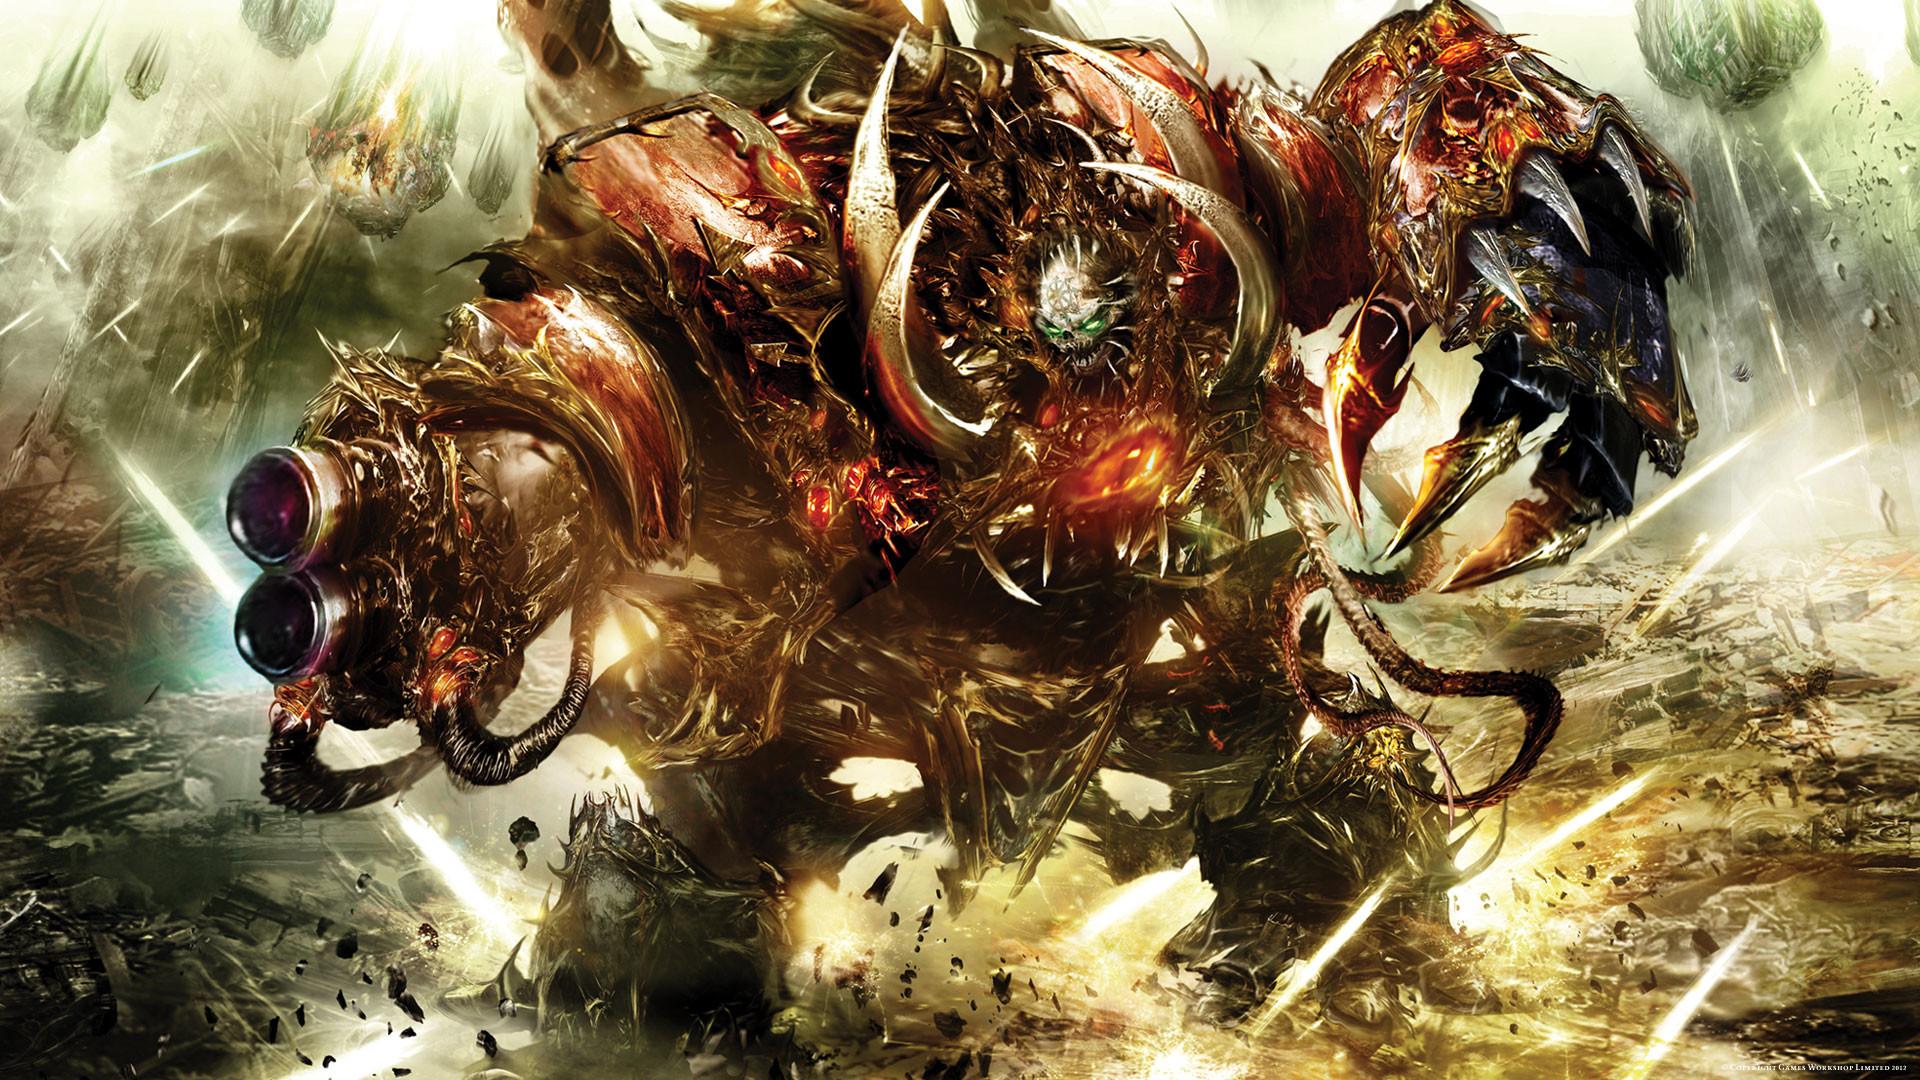 Abstract Anime Wallpaper Warhammer 40k Chaos Wallpaper 75 Images